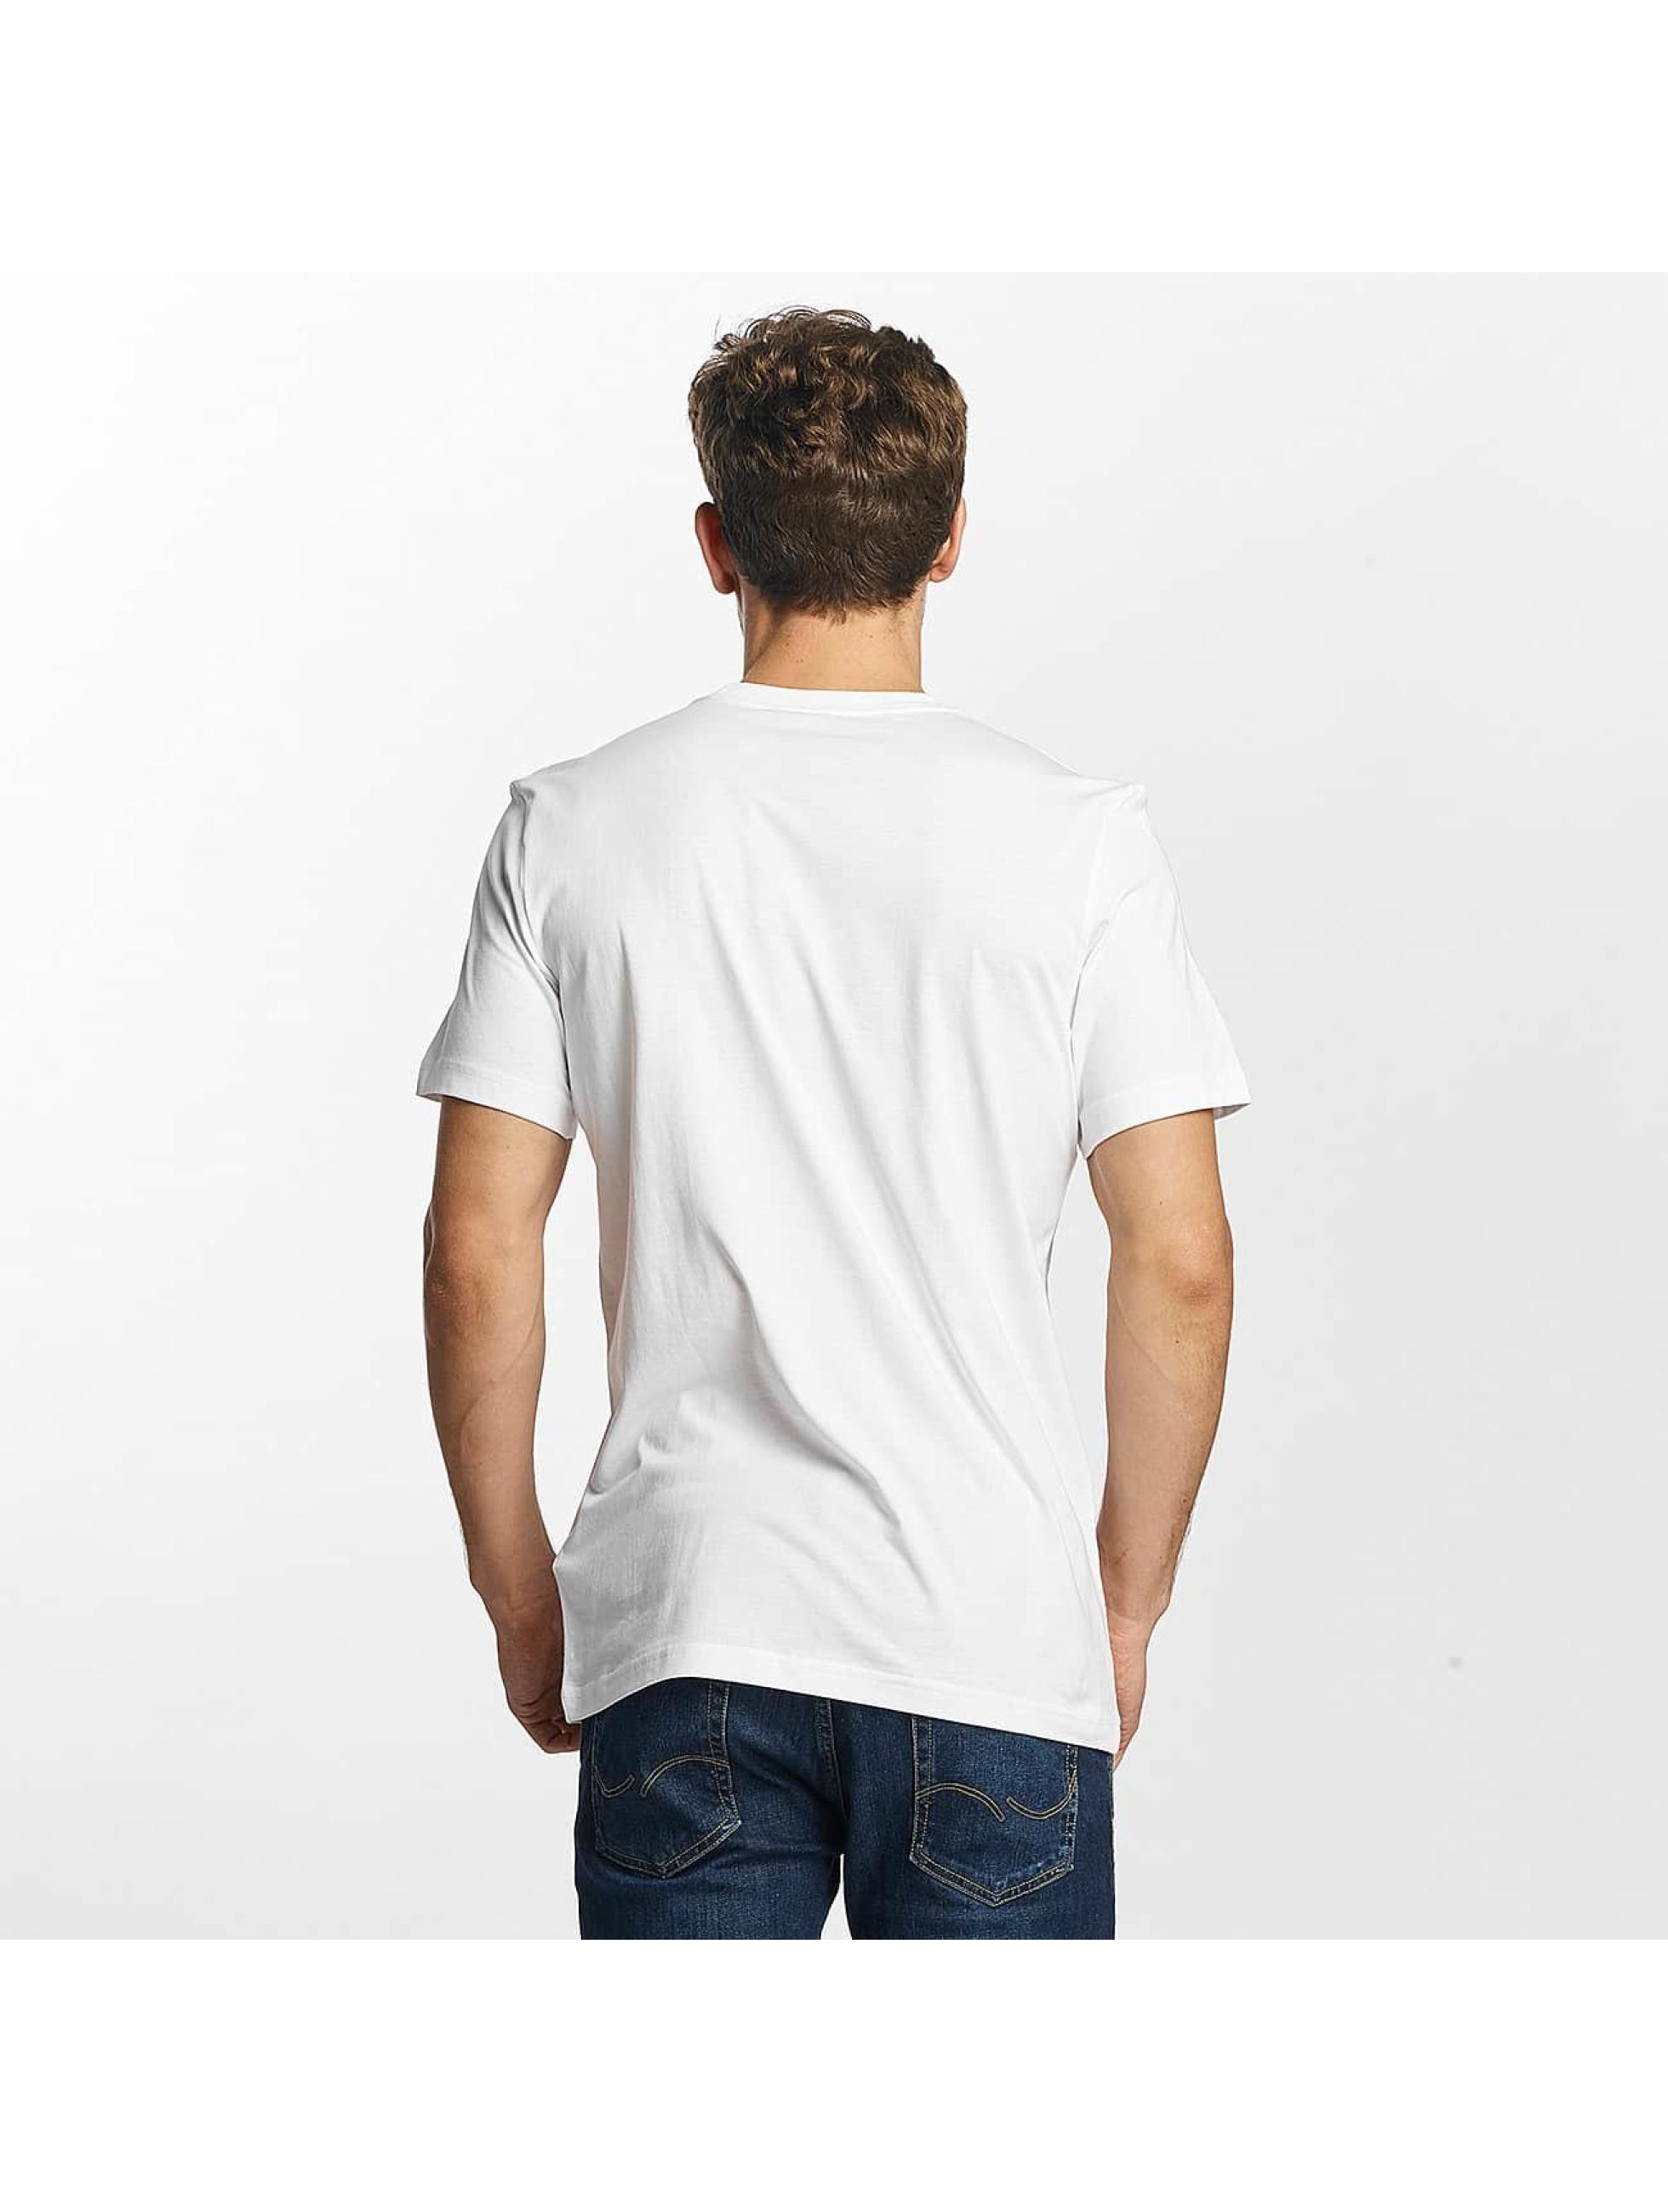 adidas originals T-Shirt Tongue Label 1 white